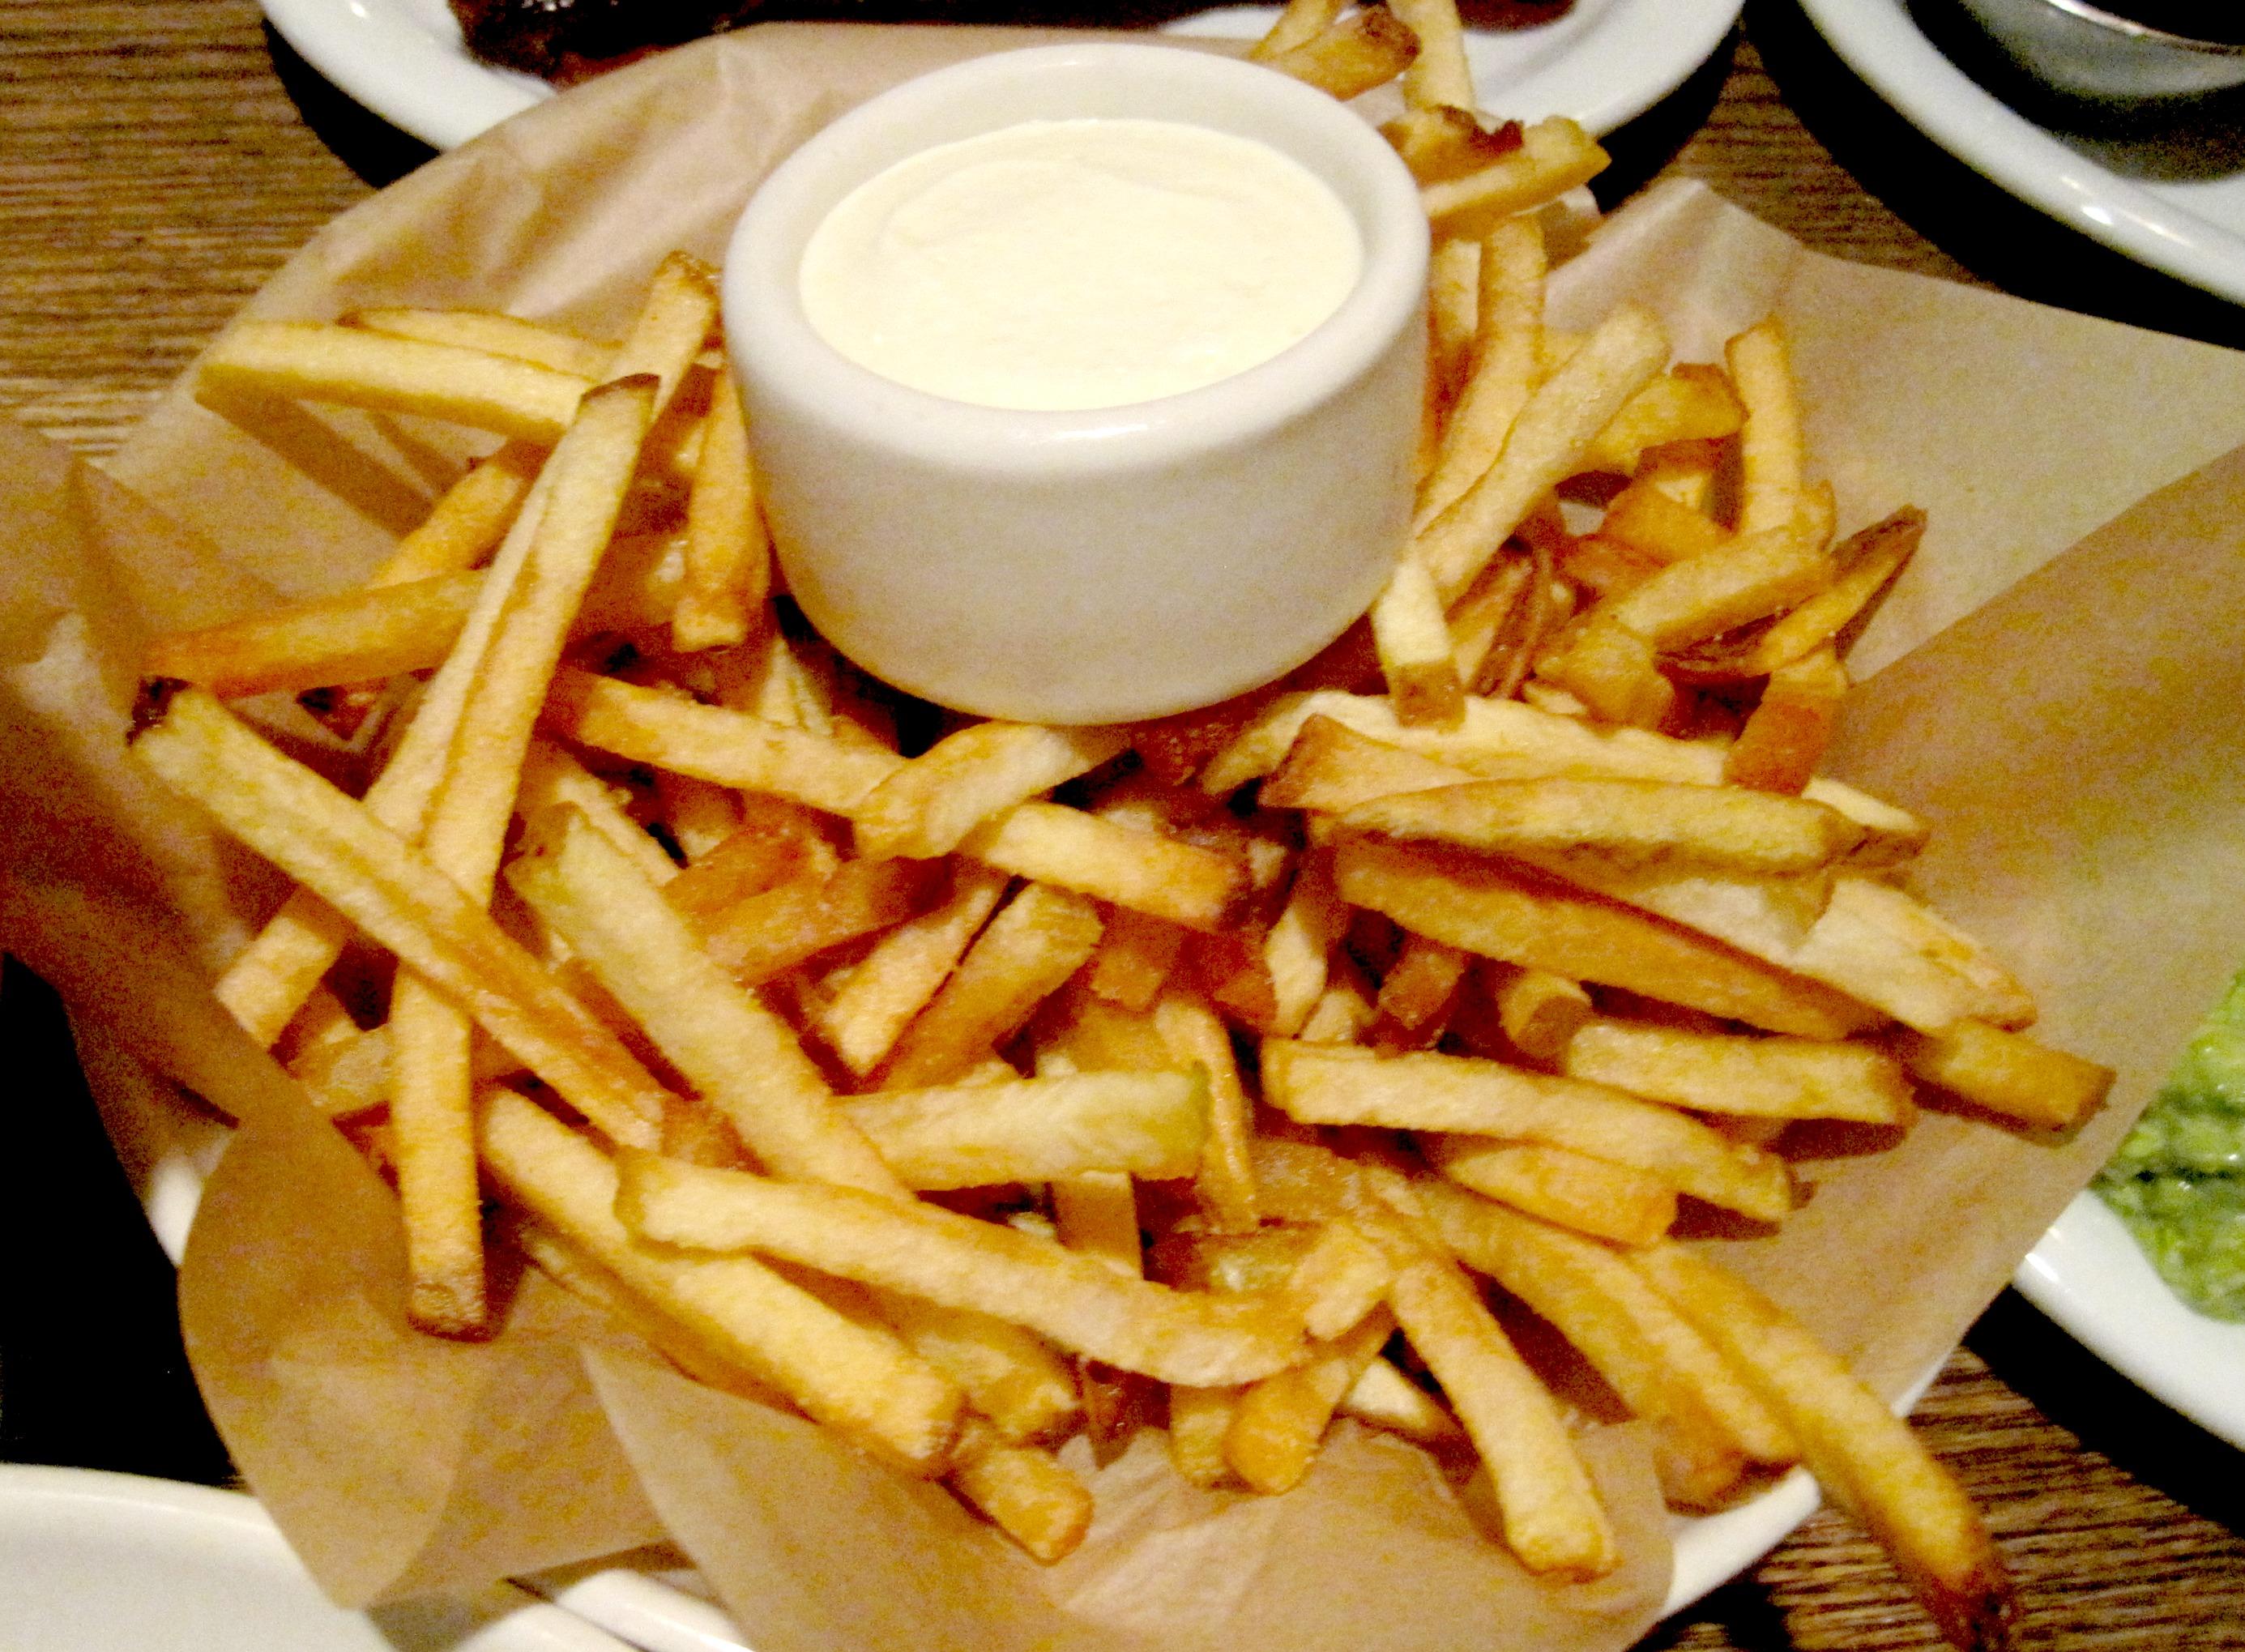 SideDoorSundaySessions Fries